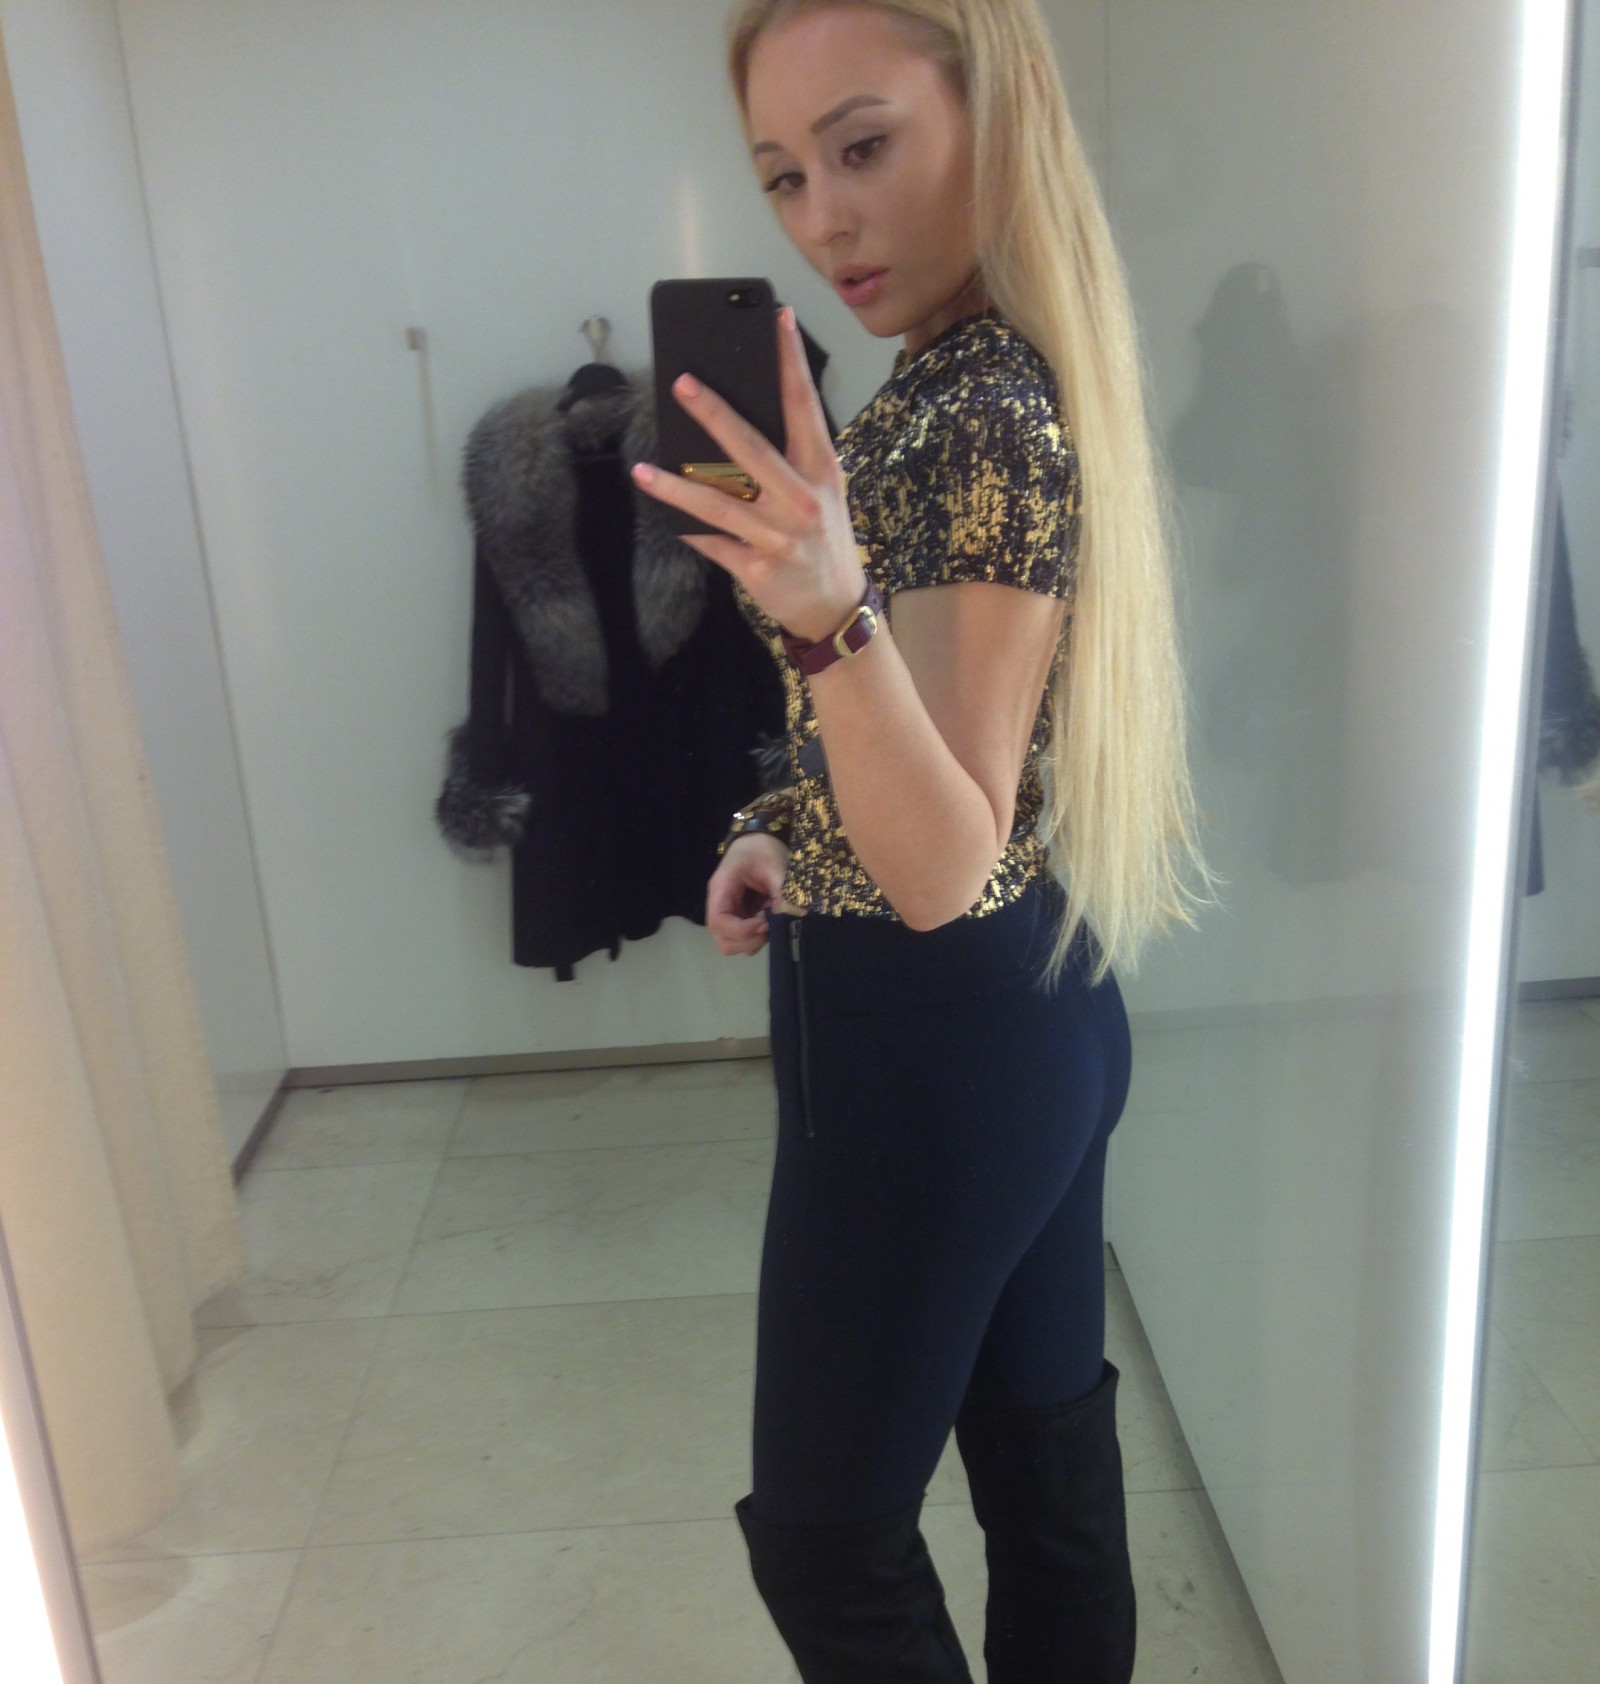 long-blonde-hair louise adolphson